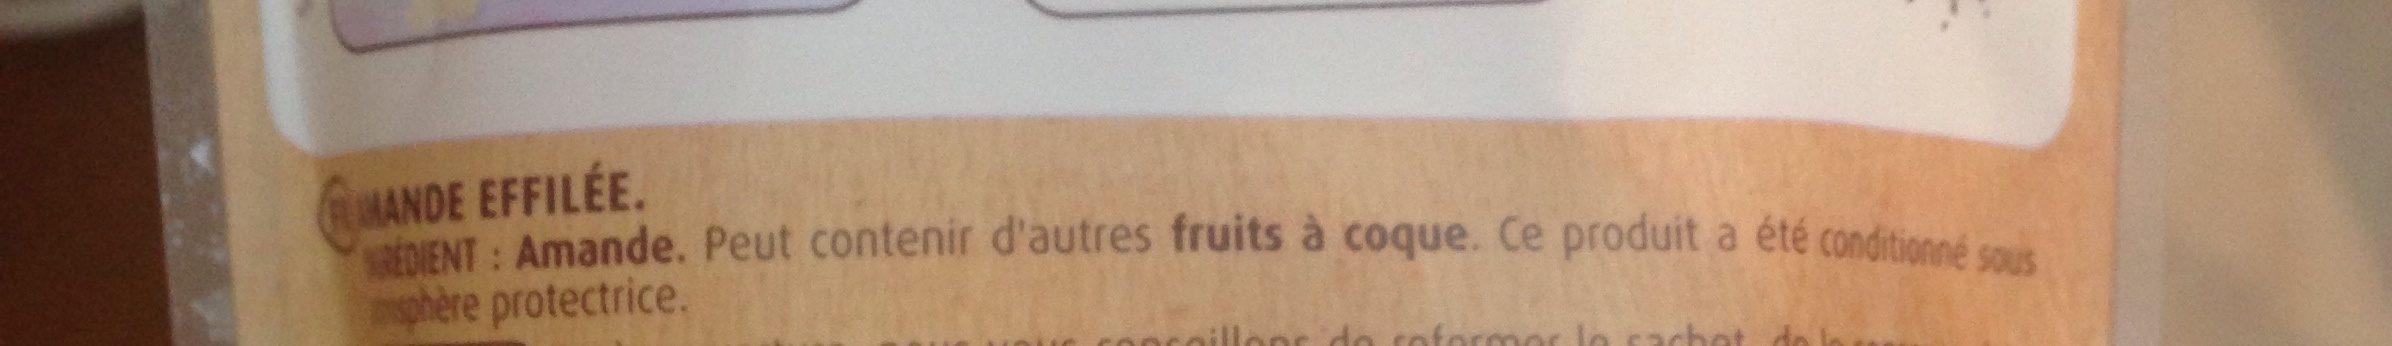 Amandes effilées - Ingrediënten